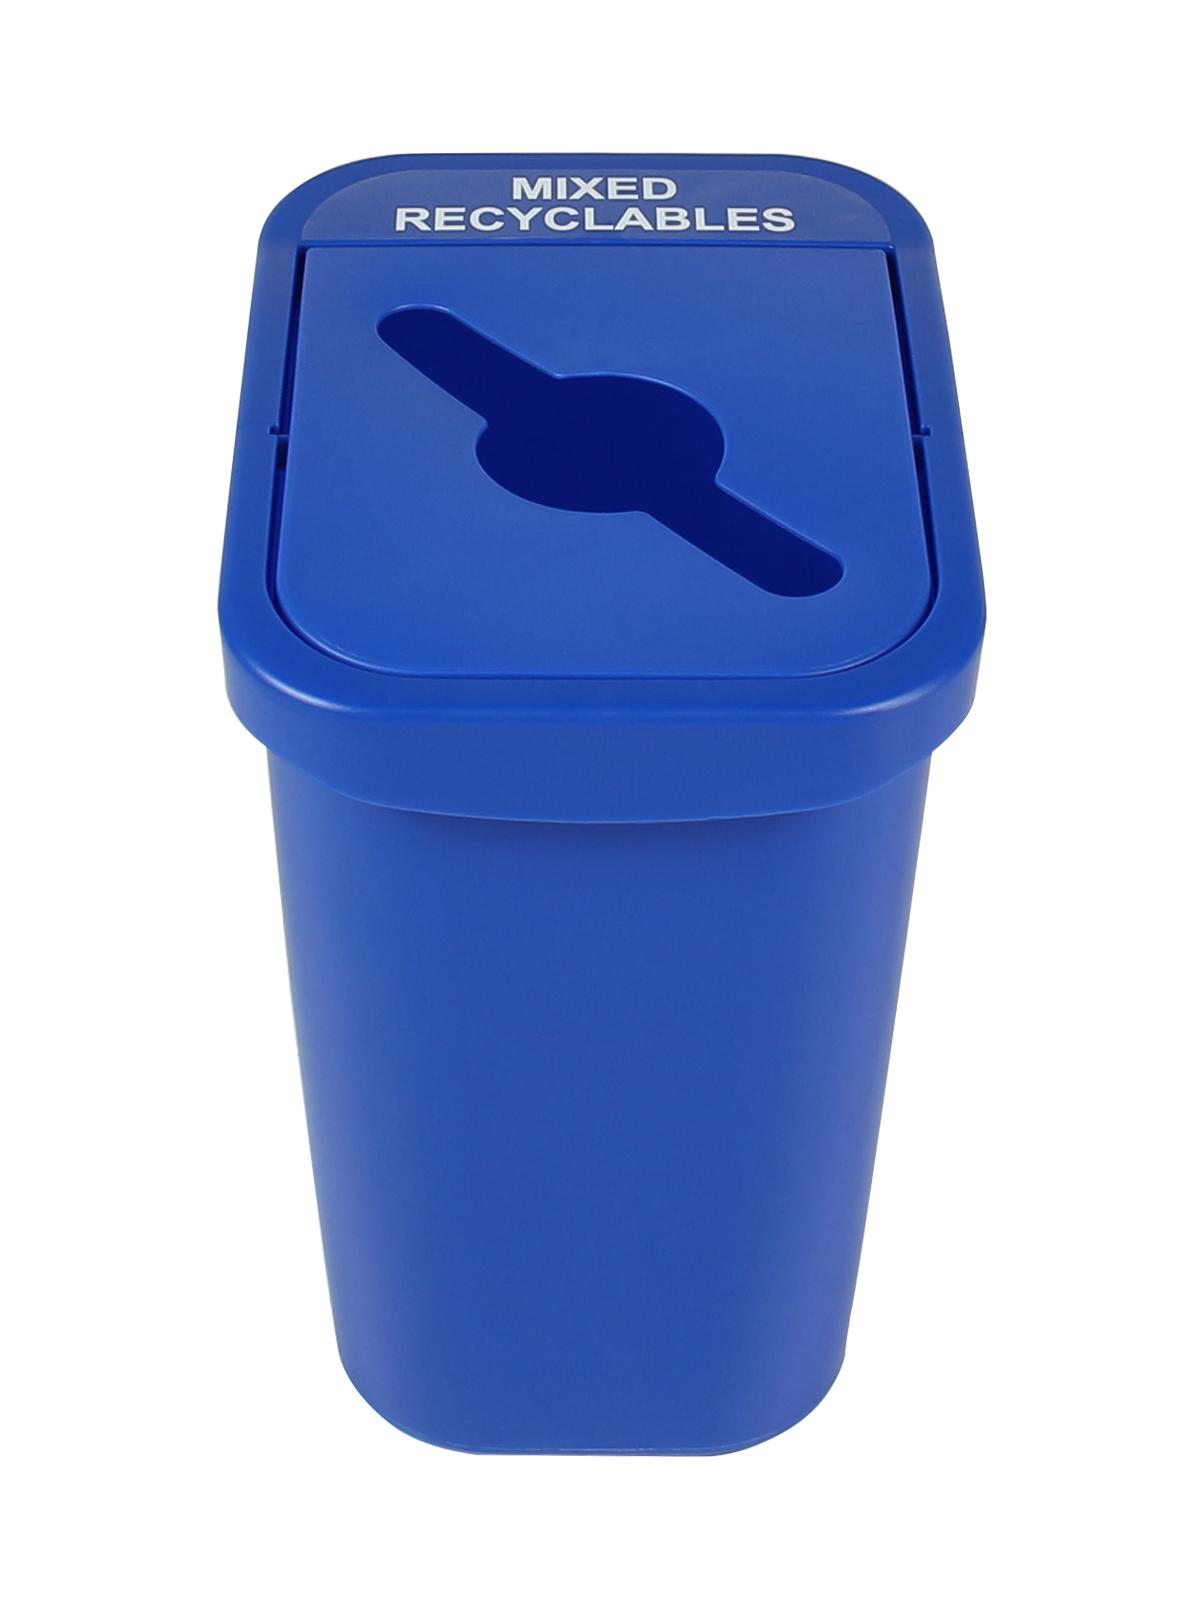 BILLI BOX - Single - 7 G - Mixed Recyclables - Mixed - Blue